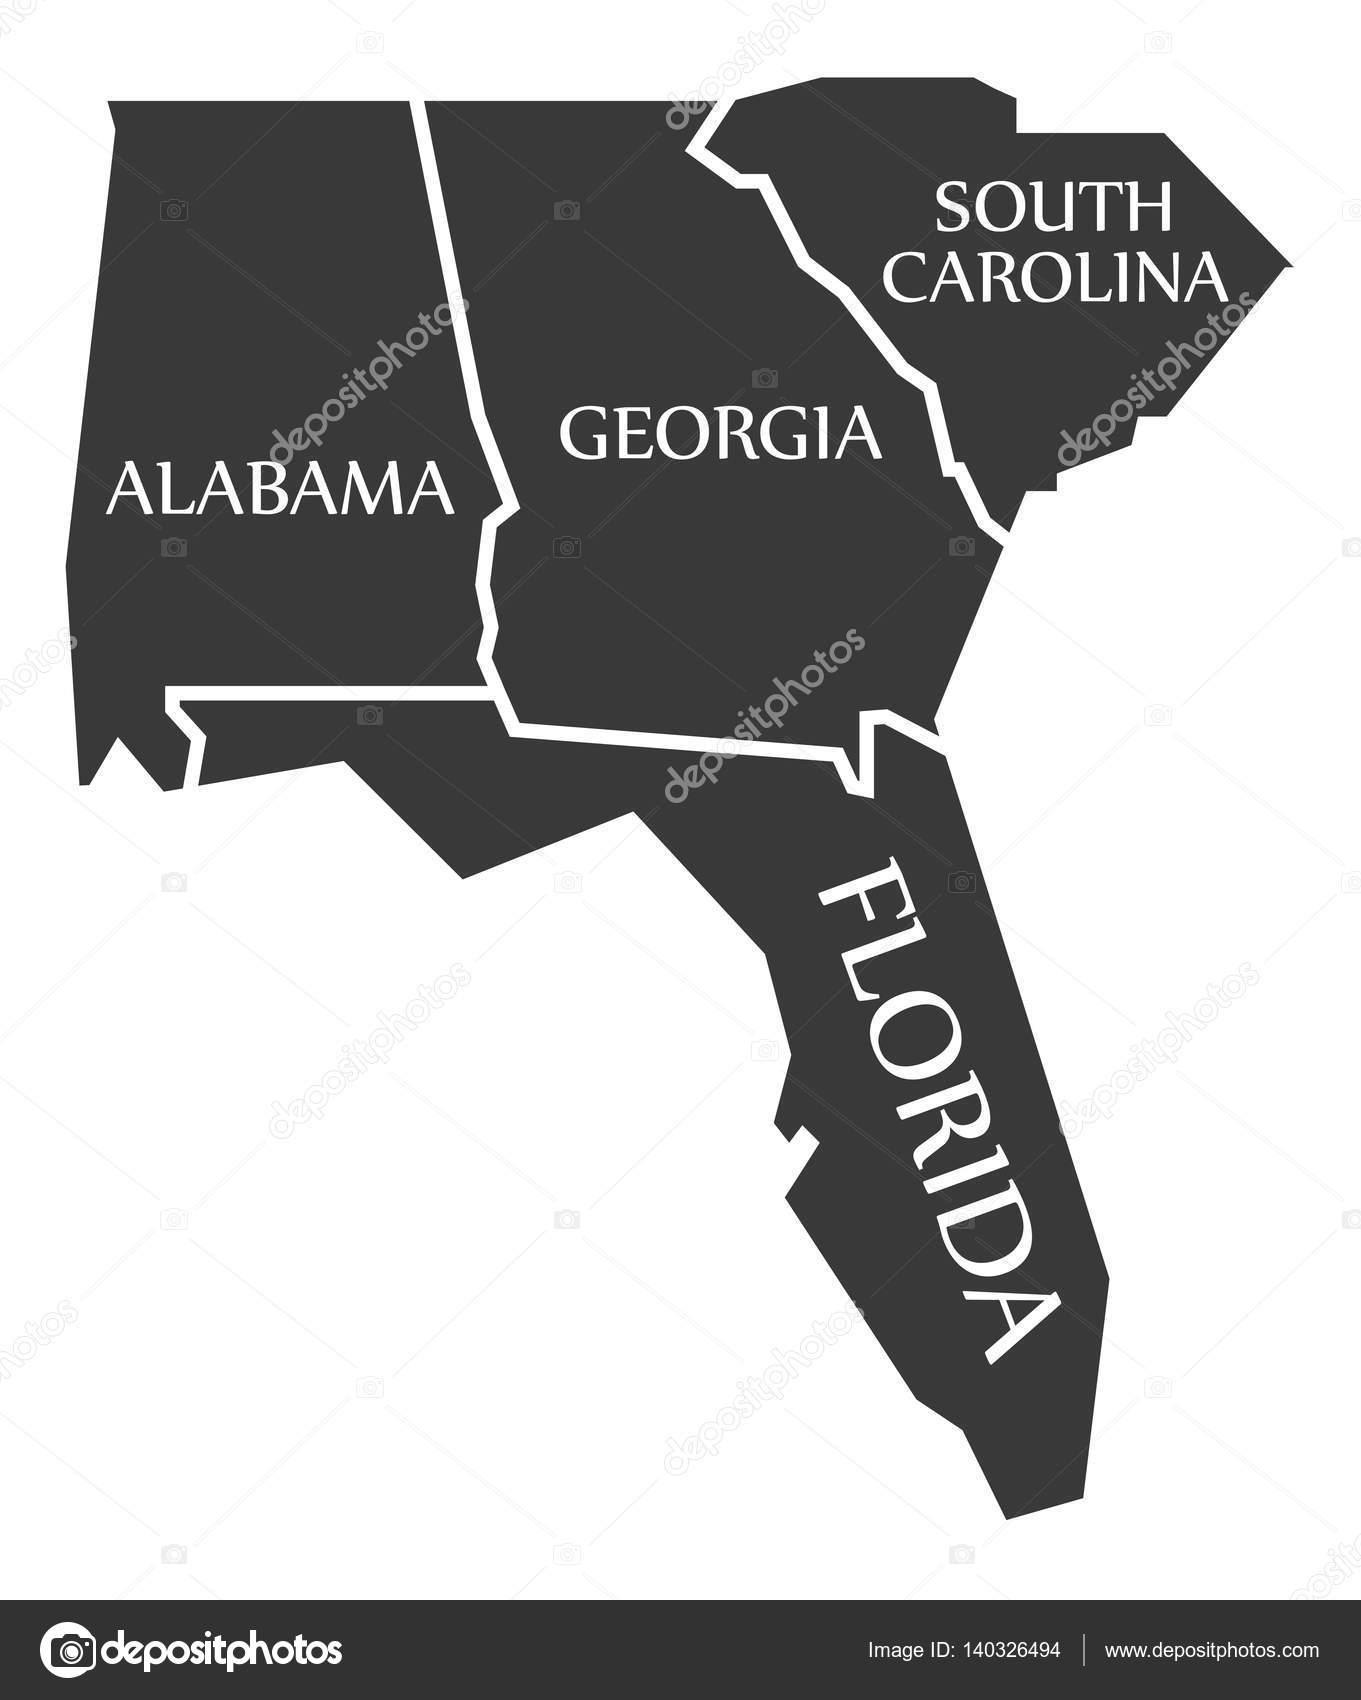 Alabama - Georgia - South Carolina - Florida Map labelled black ...